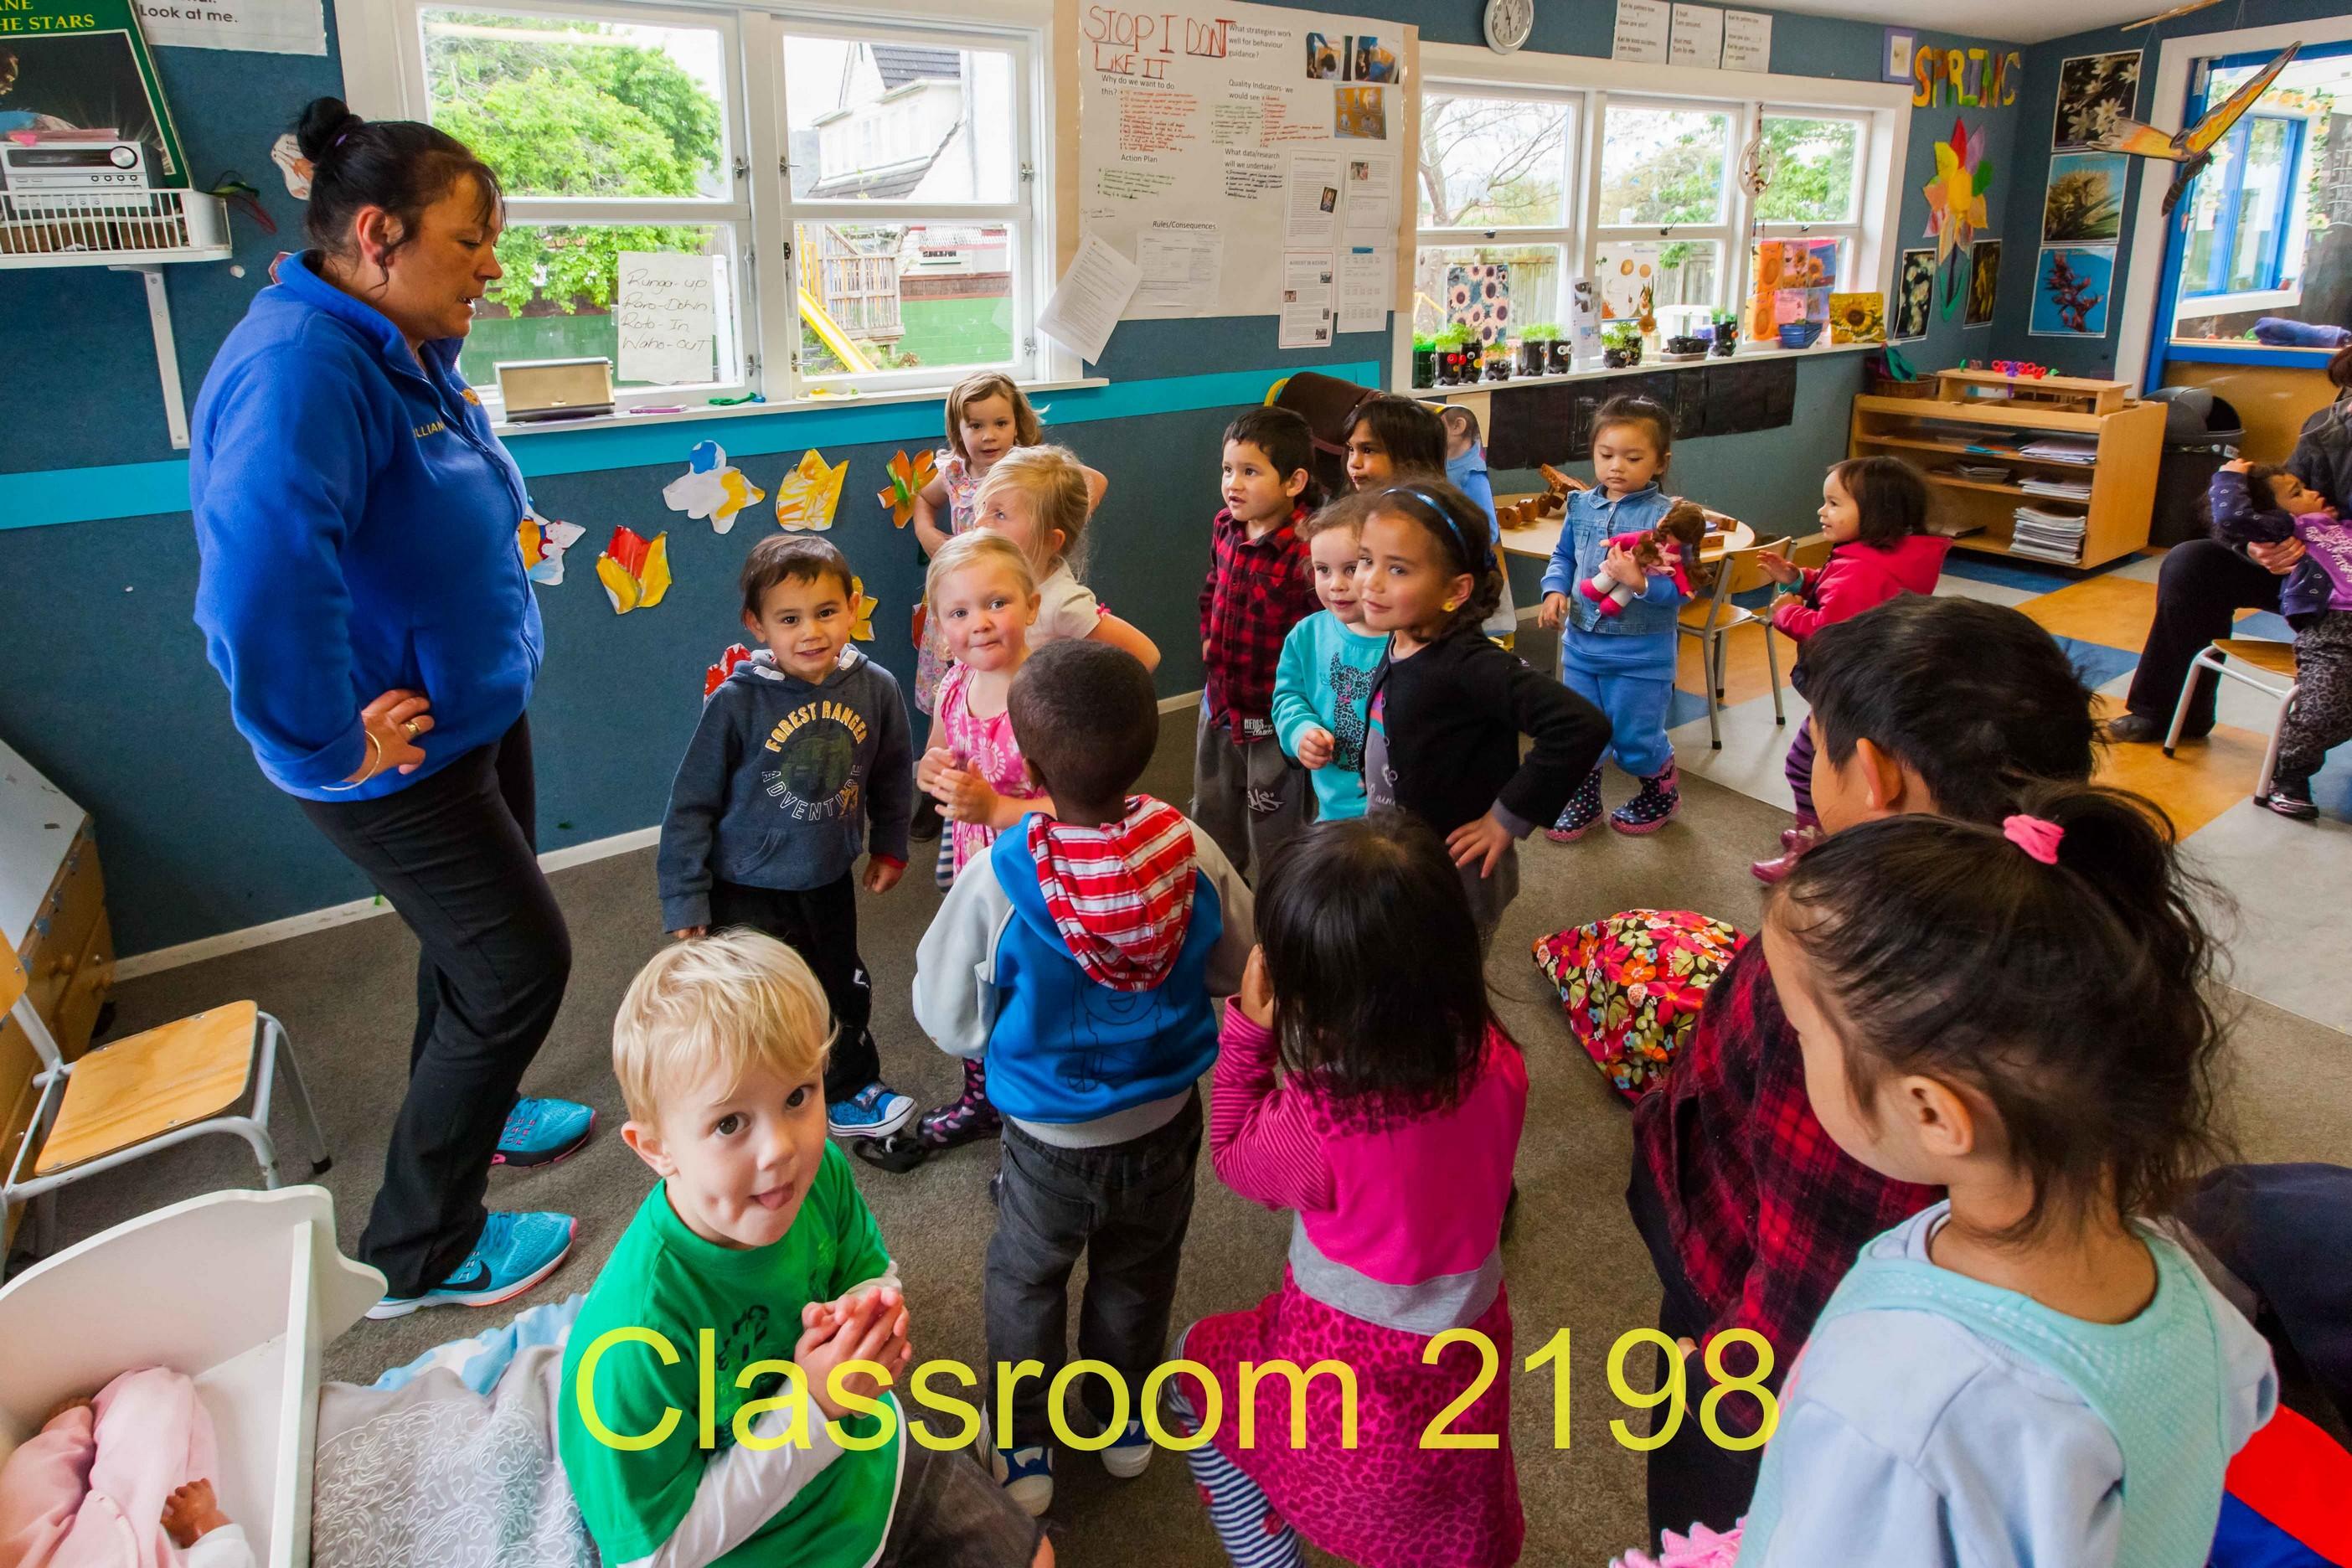 Classroom 2198